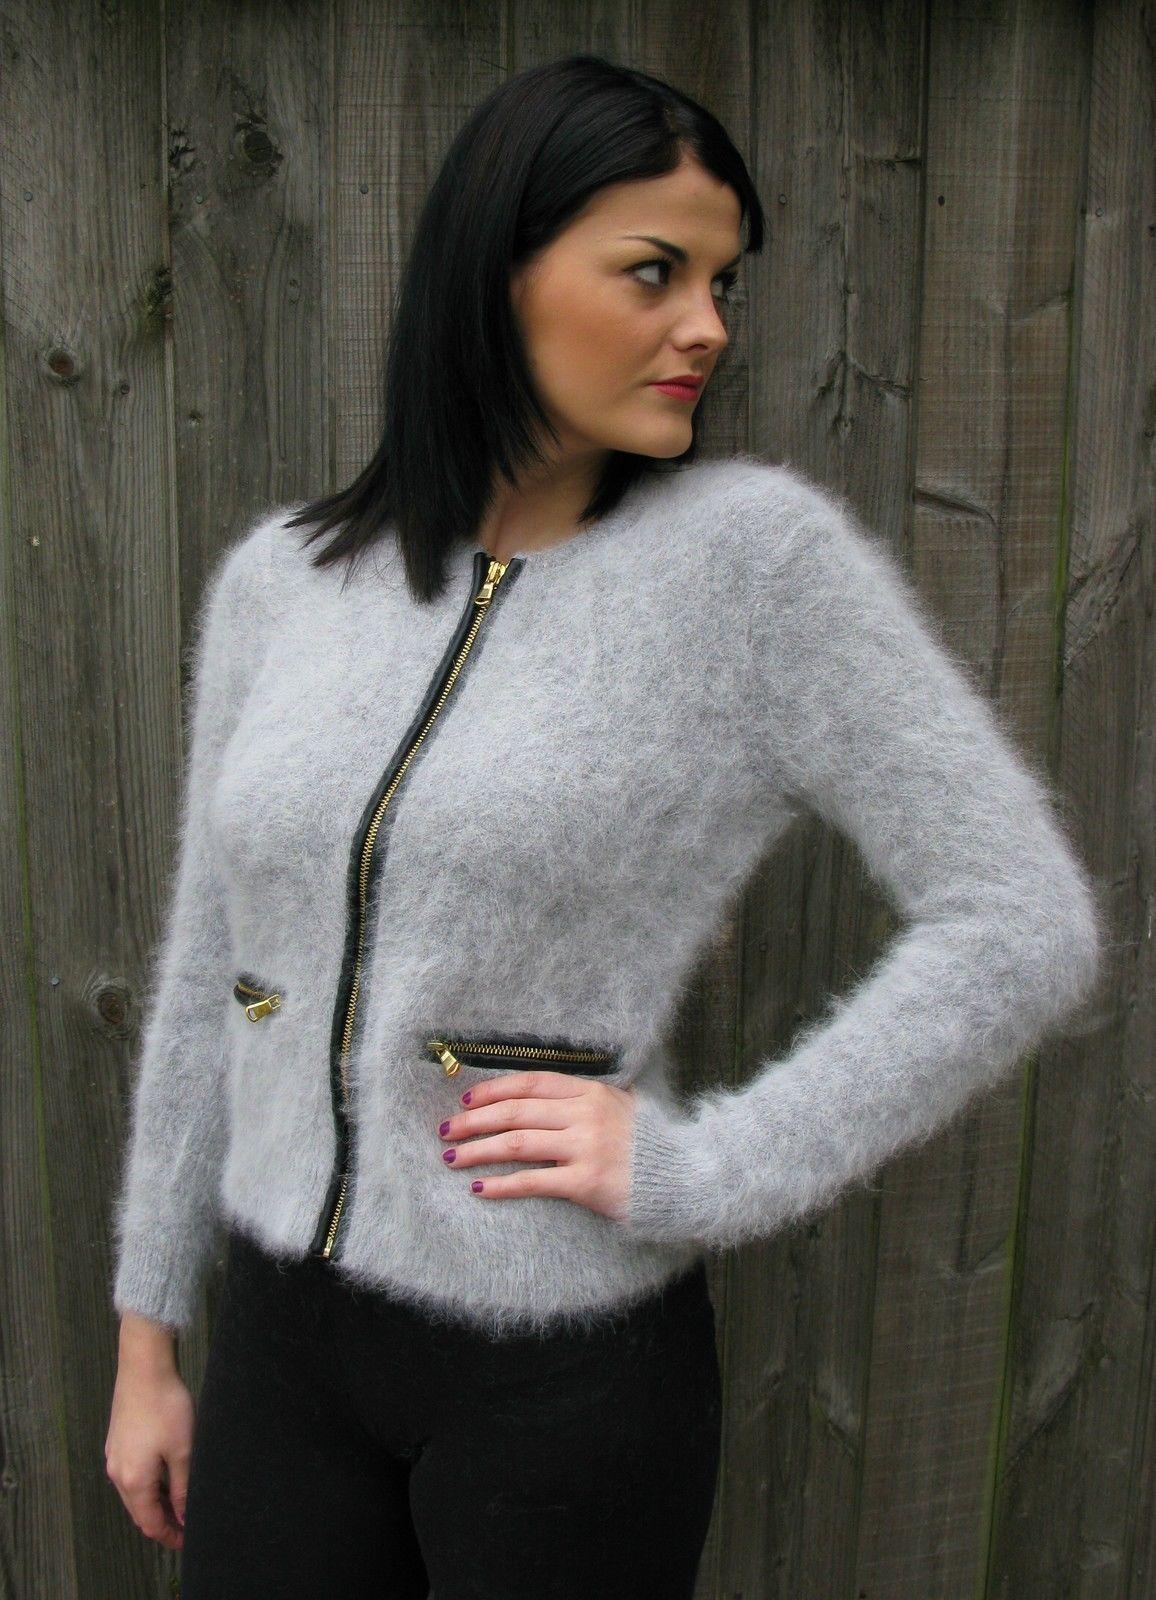 woman's angora sweater | Woman's Fuzzy Sweaters | Pinterest ...